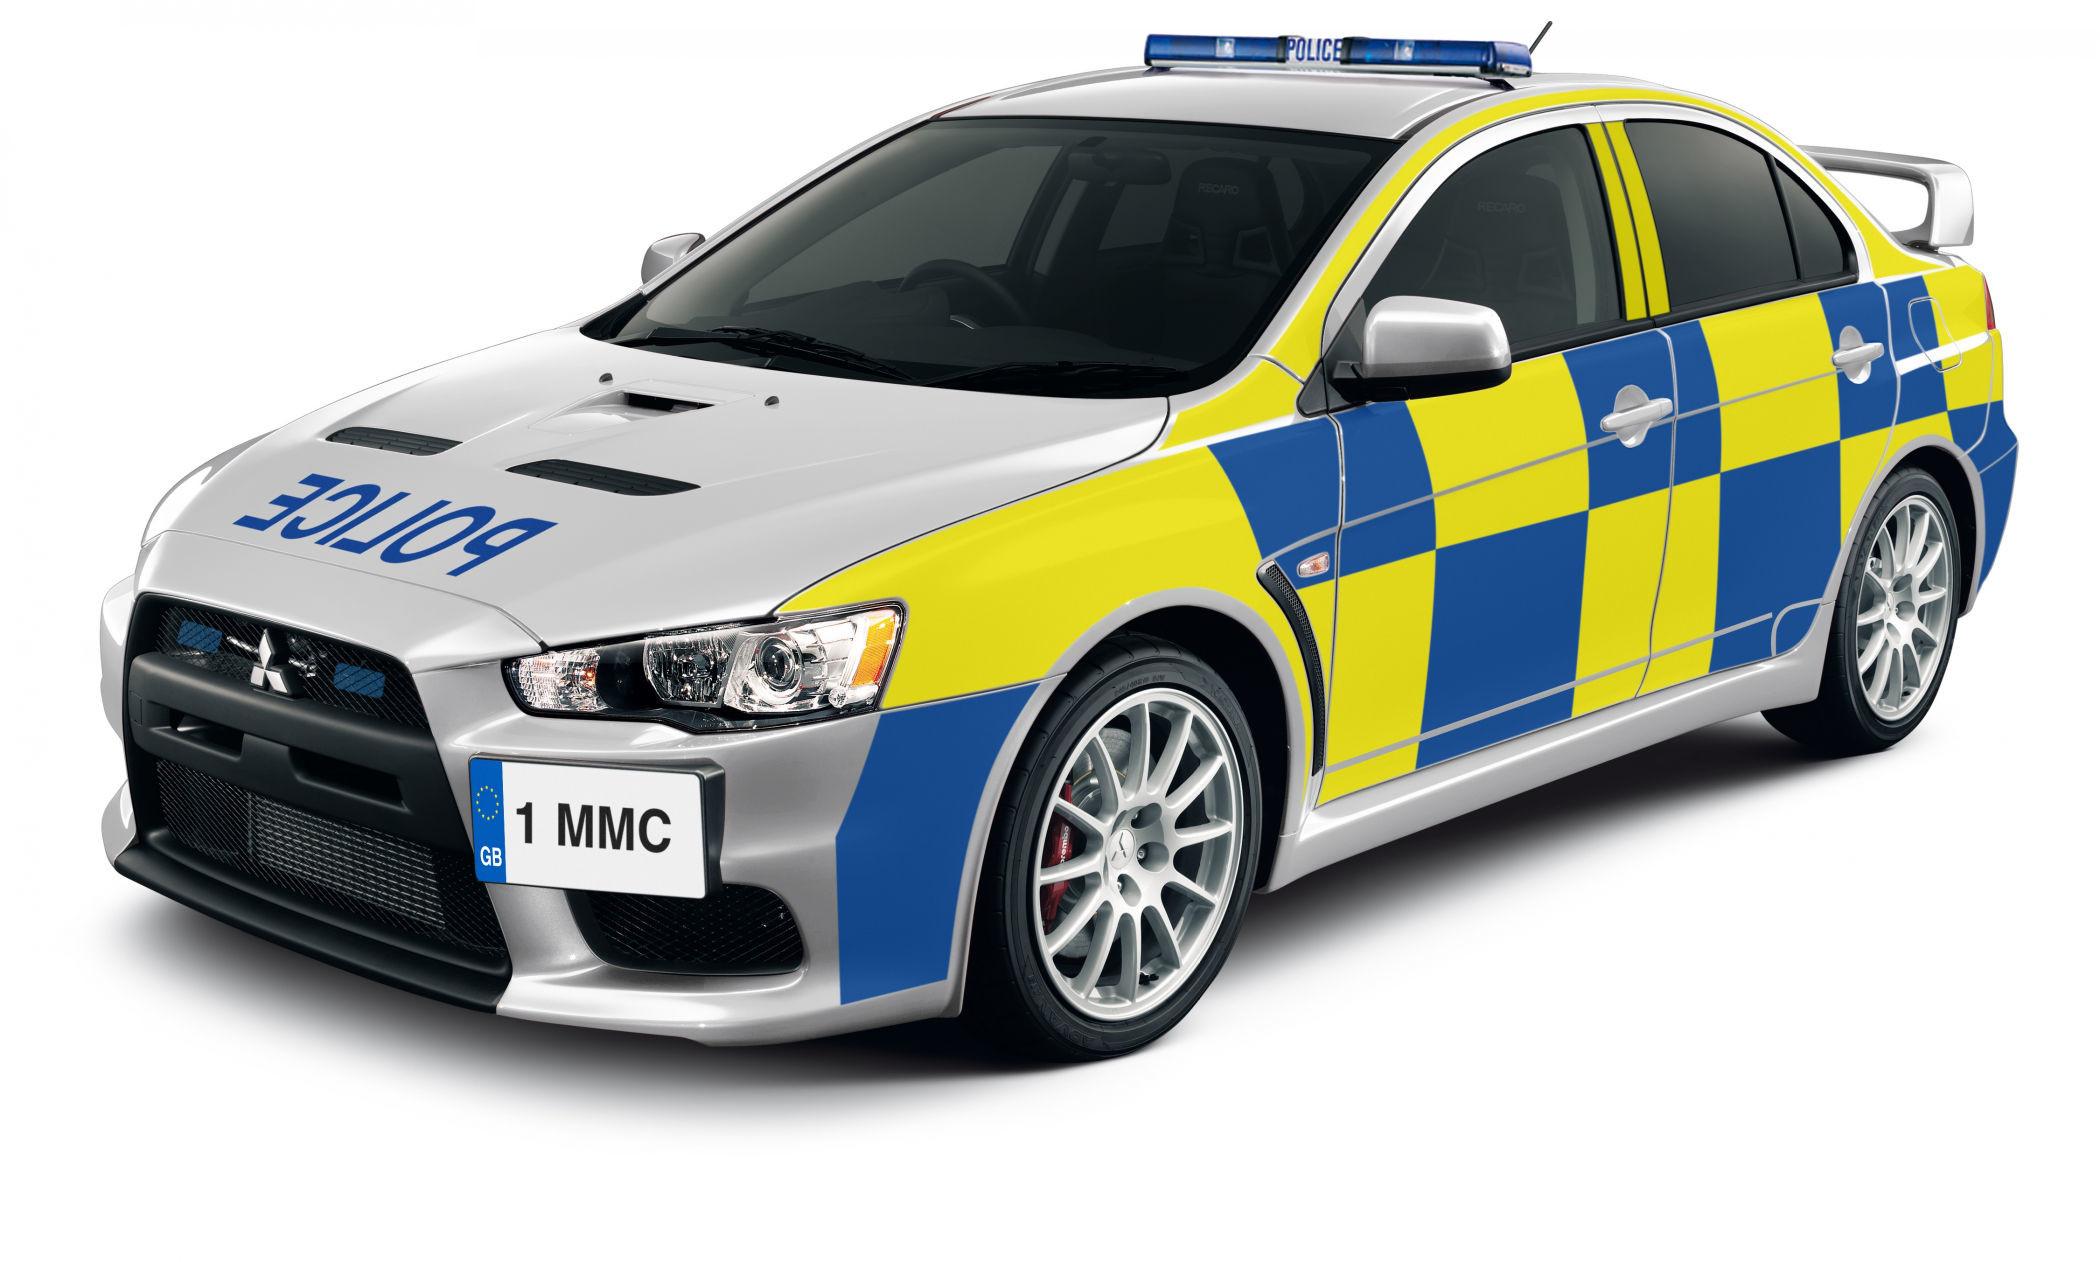 Police Car Hd Lancer Evolution X Uk Pic High Res 281052 Wallpaper wallpaper